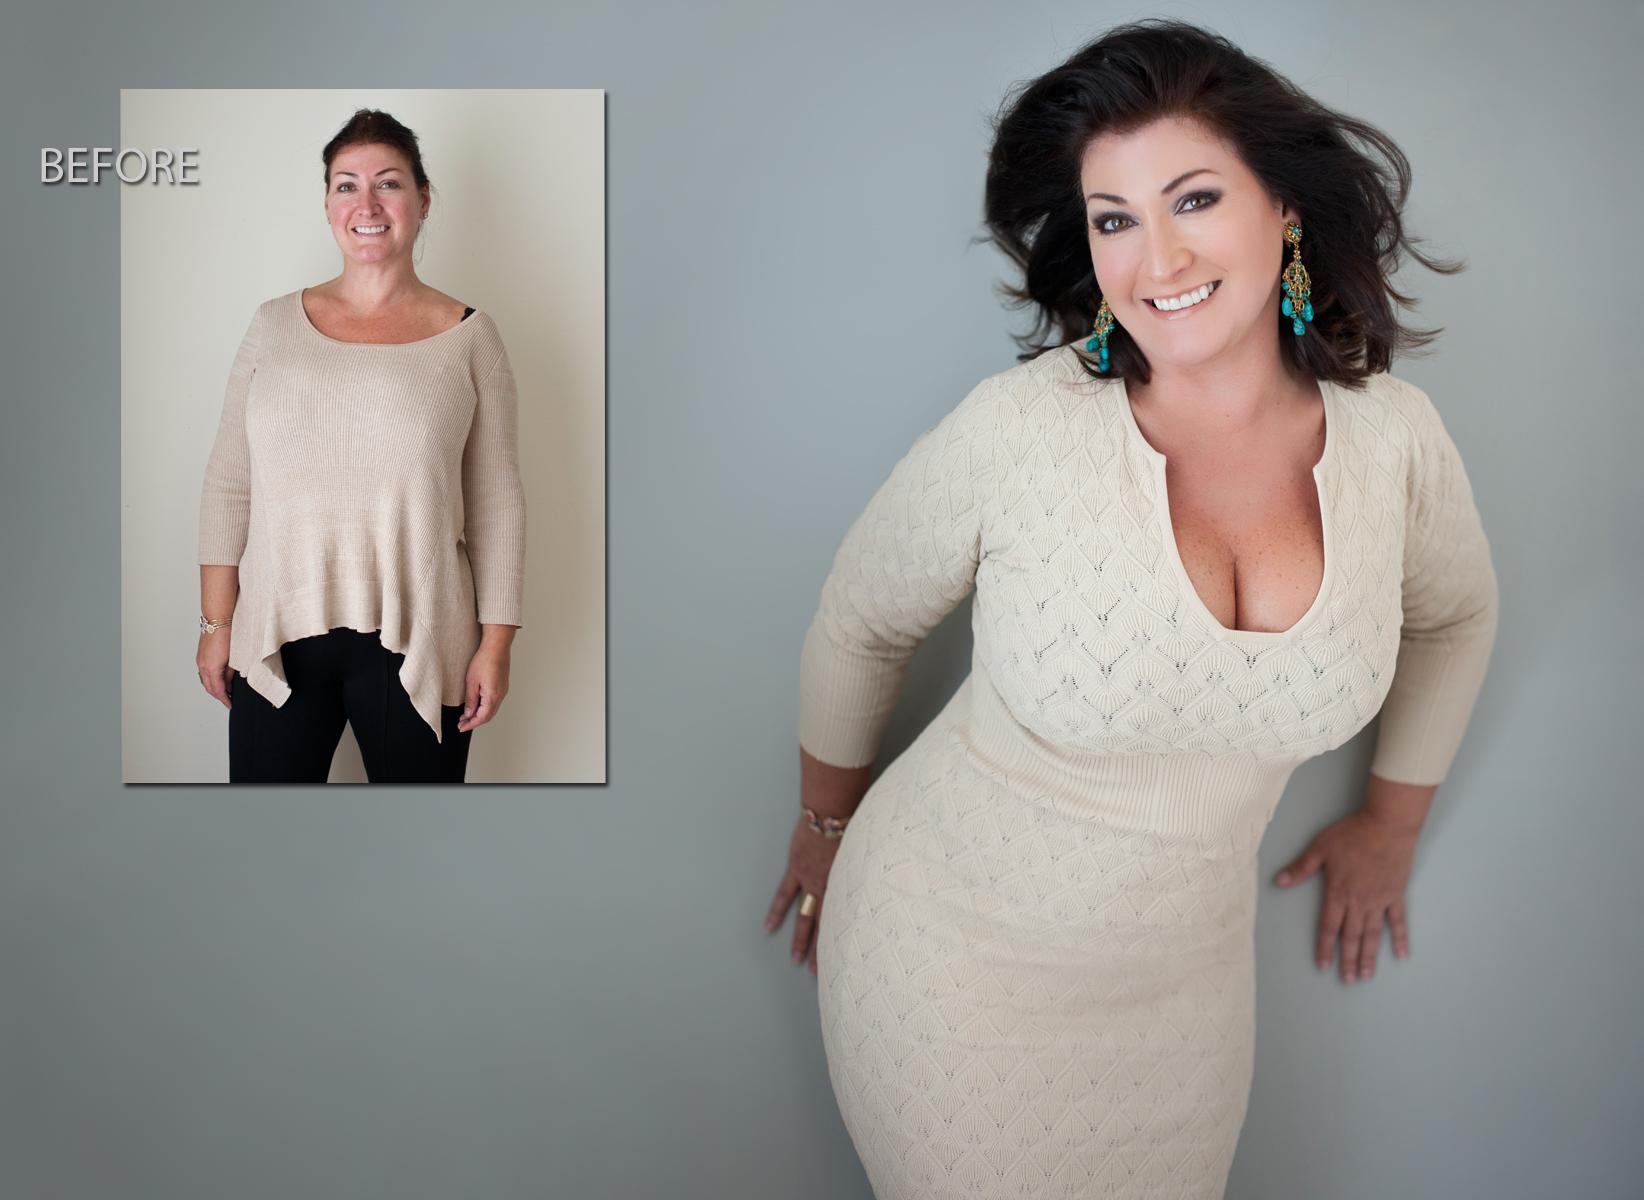 2-shapely-woman-knit-dress-posing.jpg